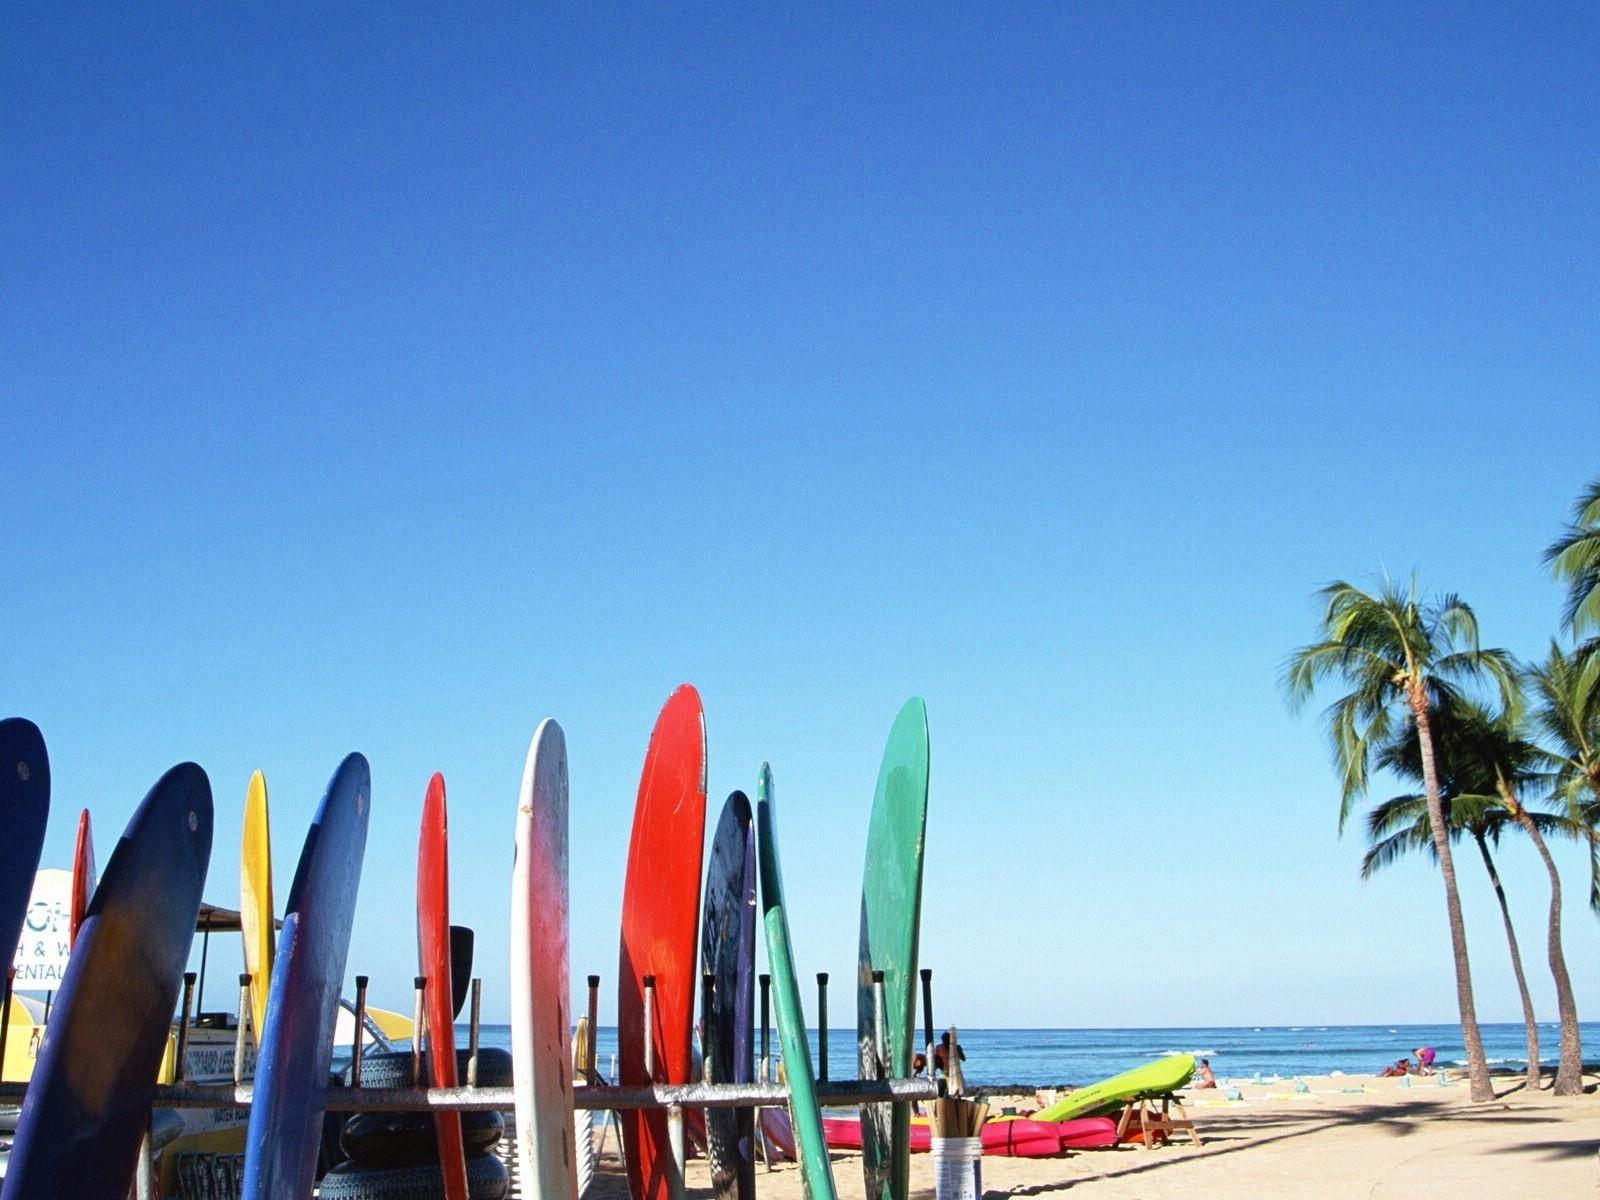 Girl On Surfboard Wallpaper Surf Beach Hd Backgrounds Pixels Talk